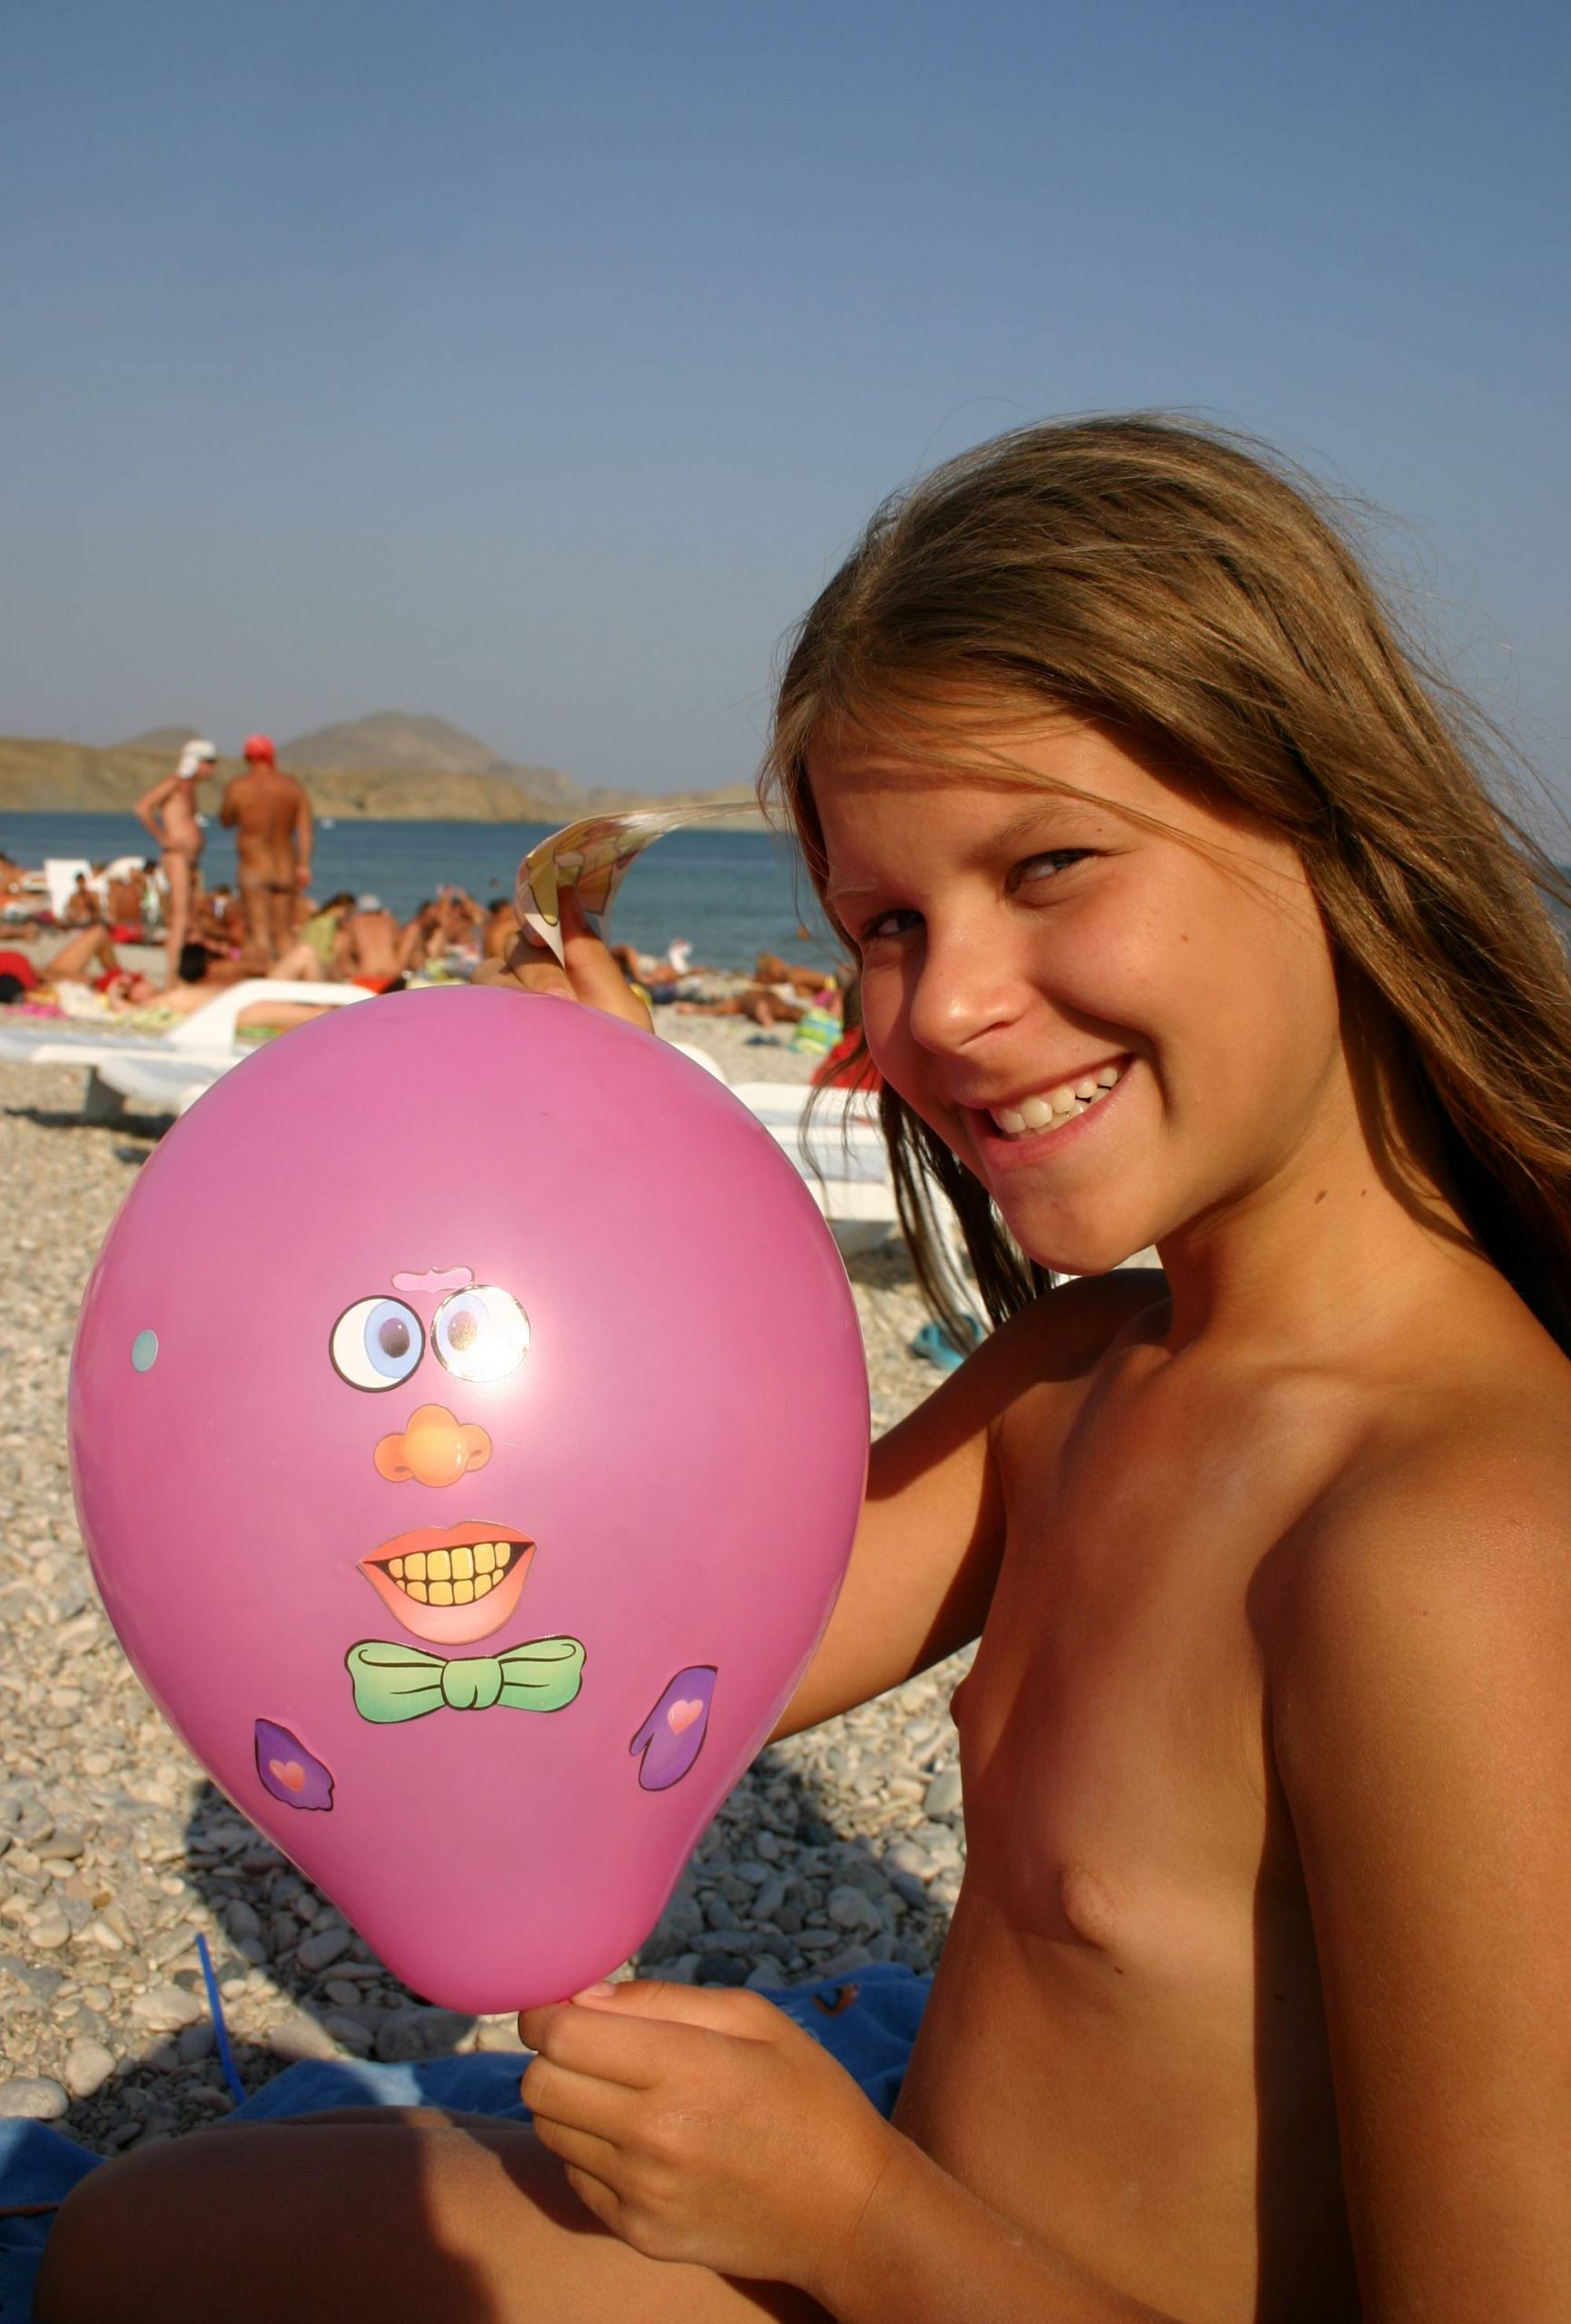 Our Beach Balloon Profile - 3